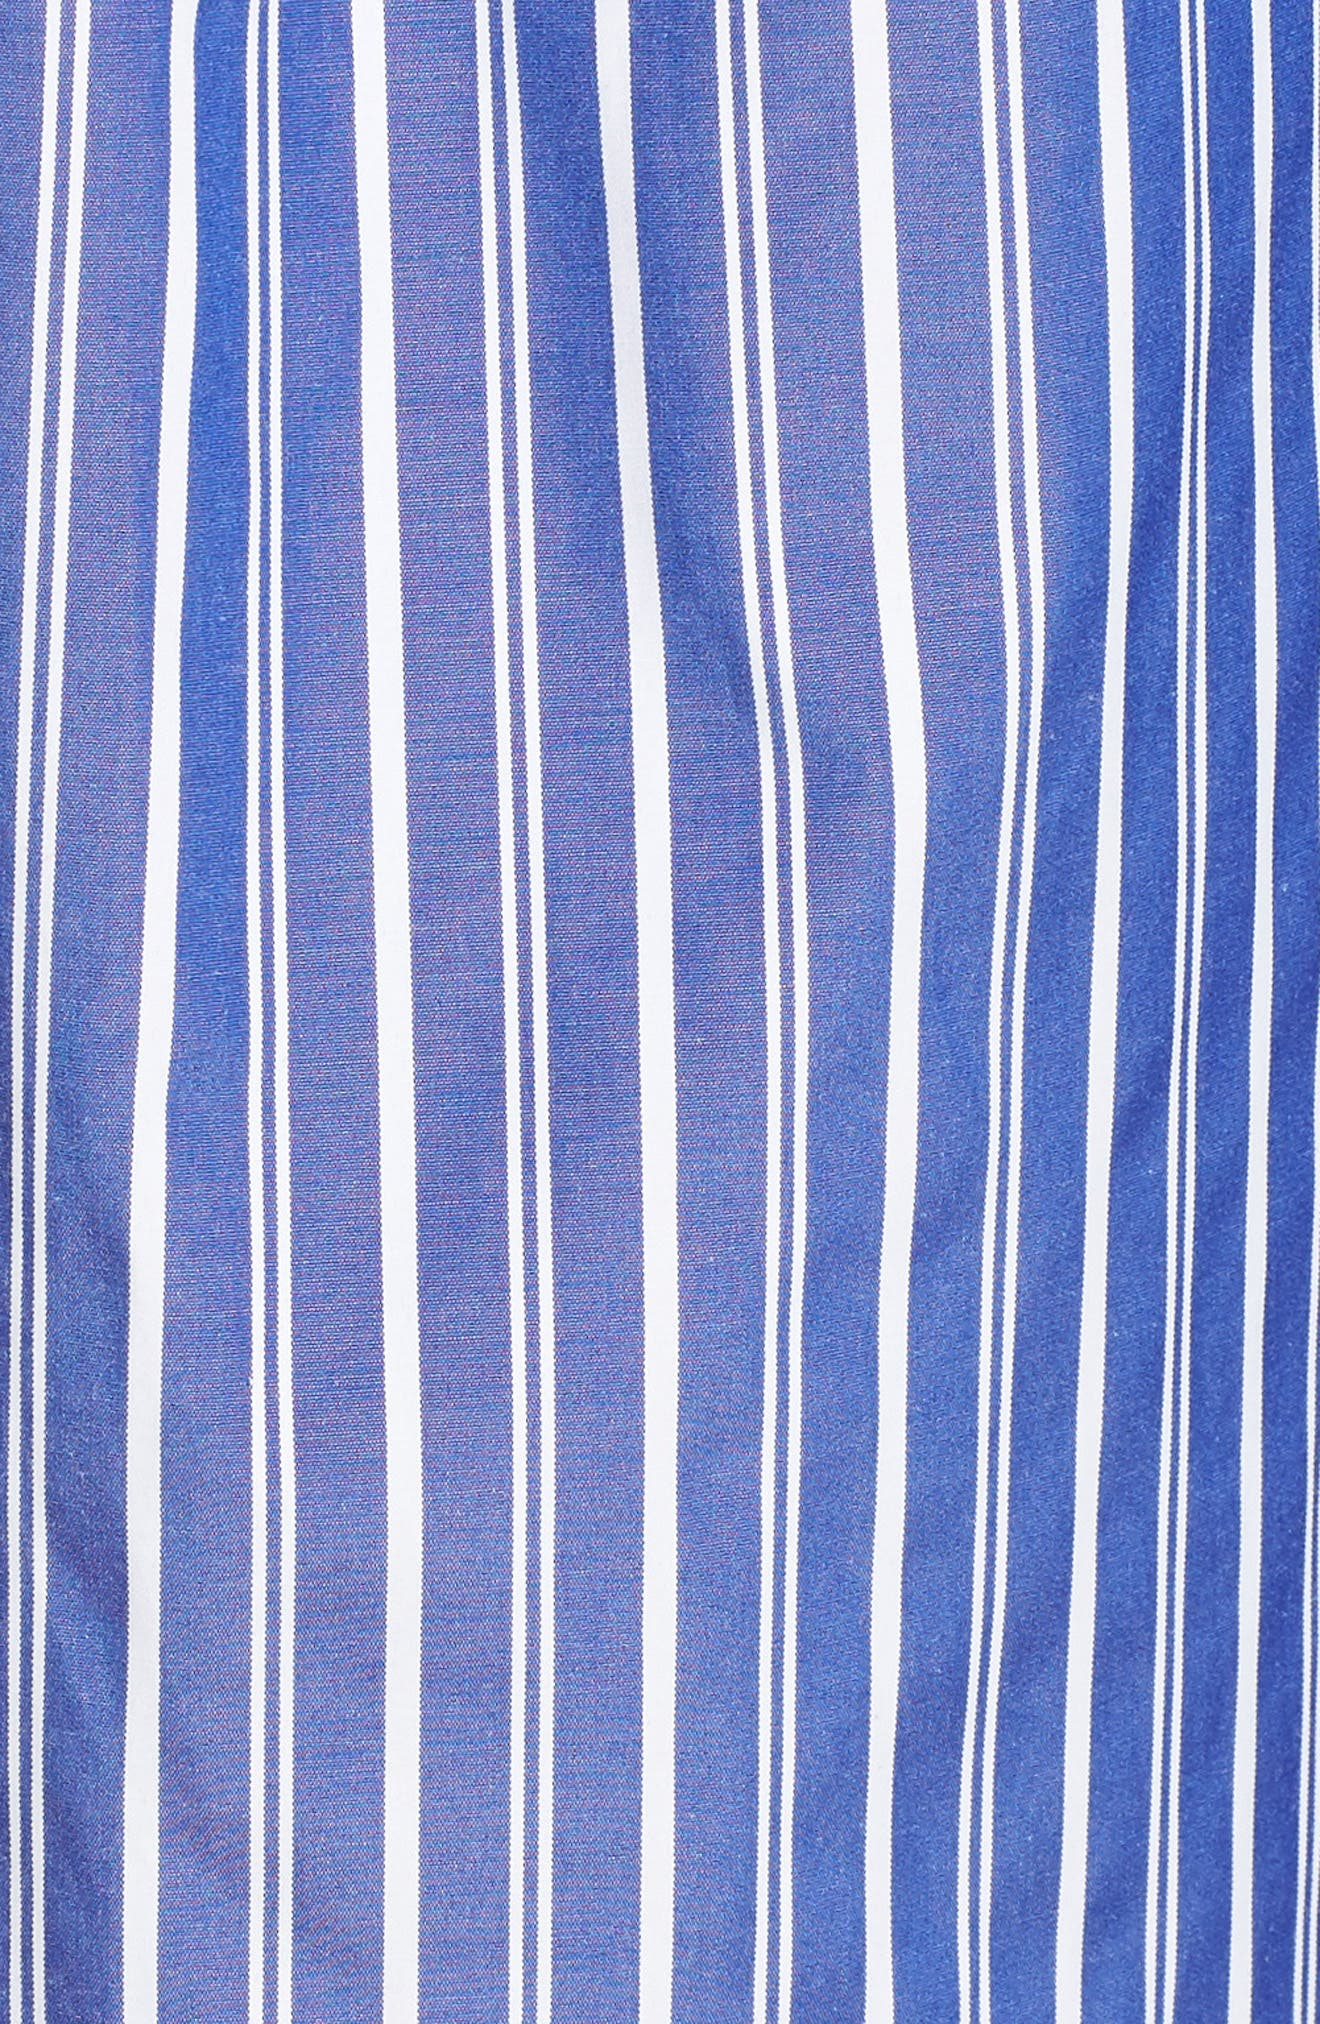 Zadeh Pants,                             Alternate thumbnail 5, color,                             Blue/ White